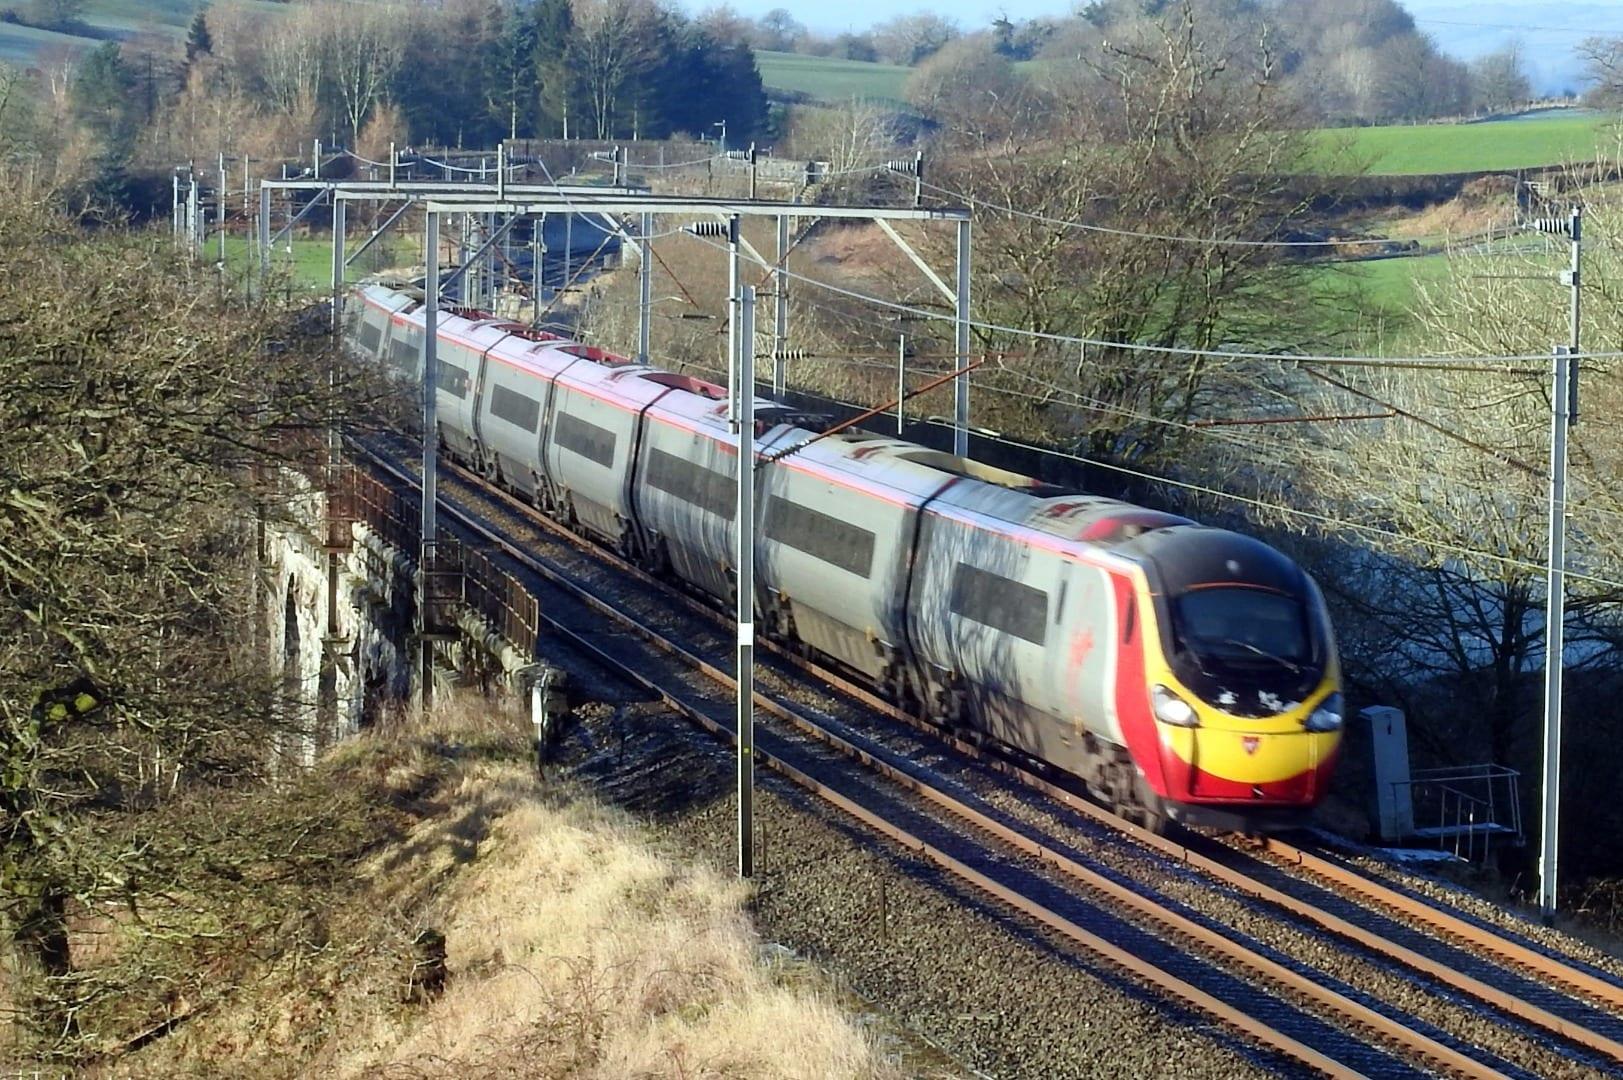 Pendolino electric train. Photo Barrie C Woods